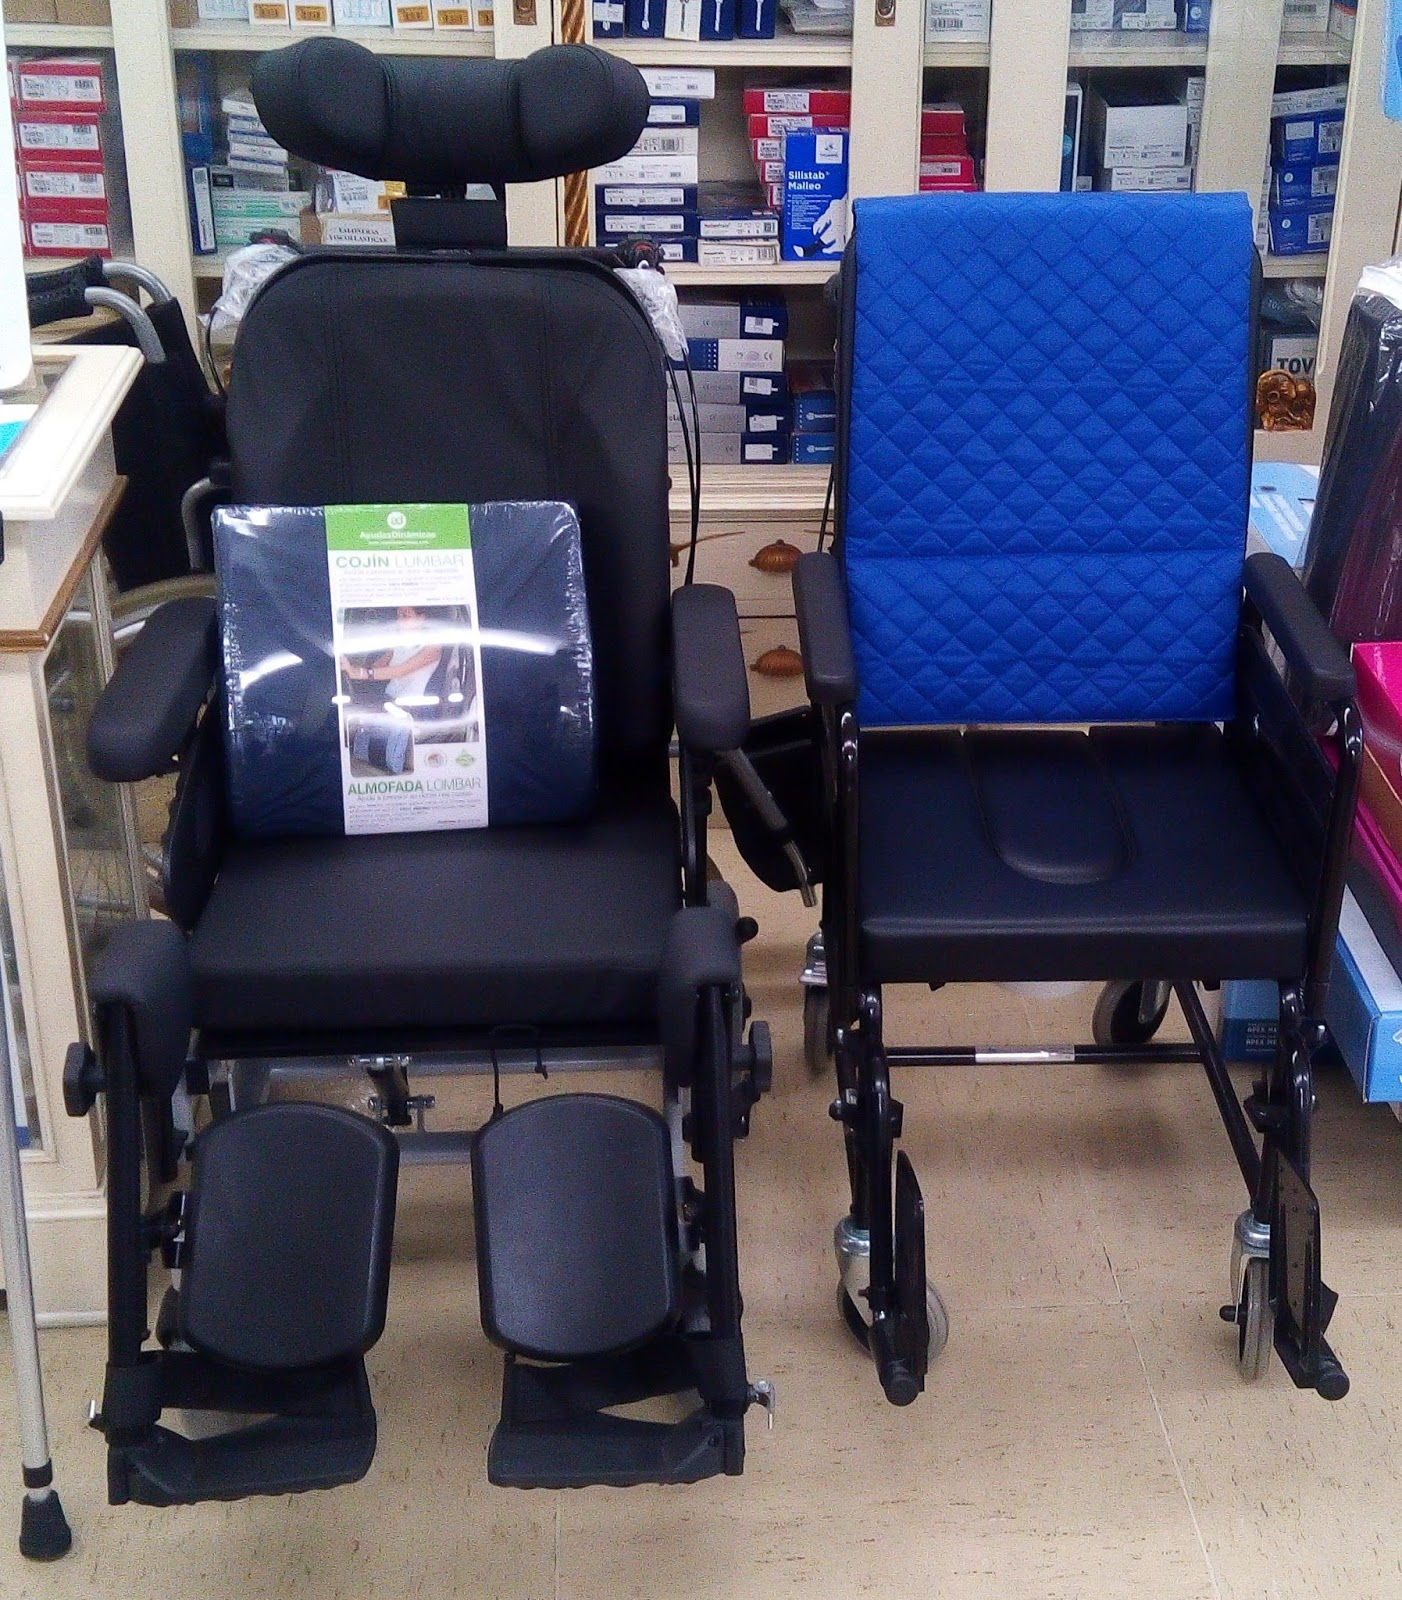 Ortopedia en valladolid l pez g mez alquiler de sillas de ruedas - Alquiler de sillas de ruedas electricas ...